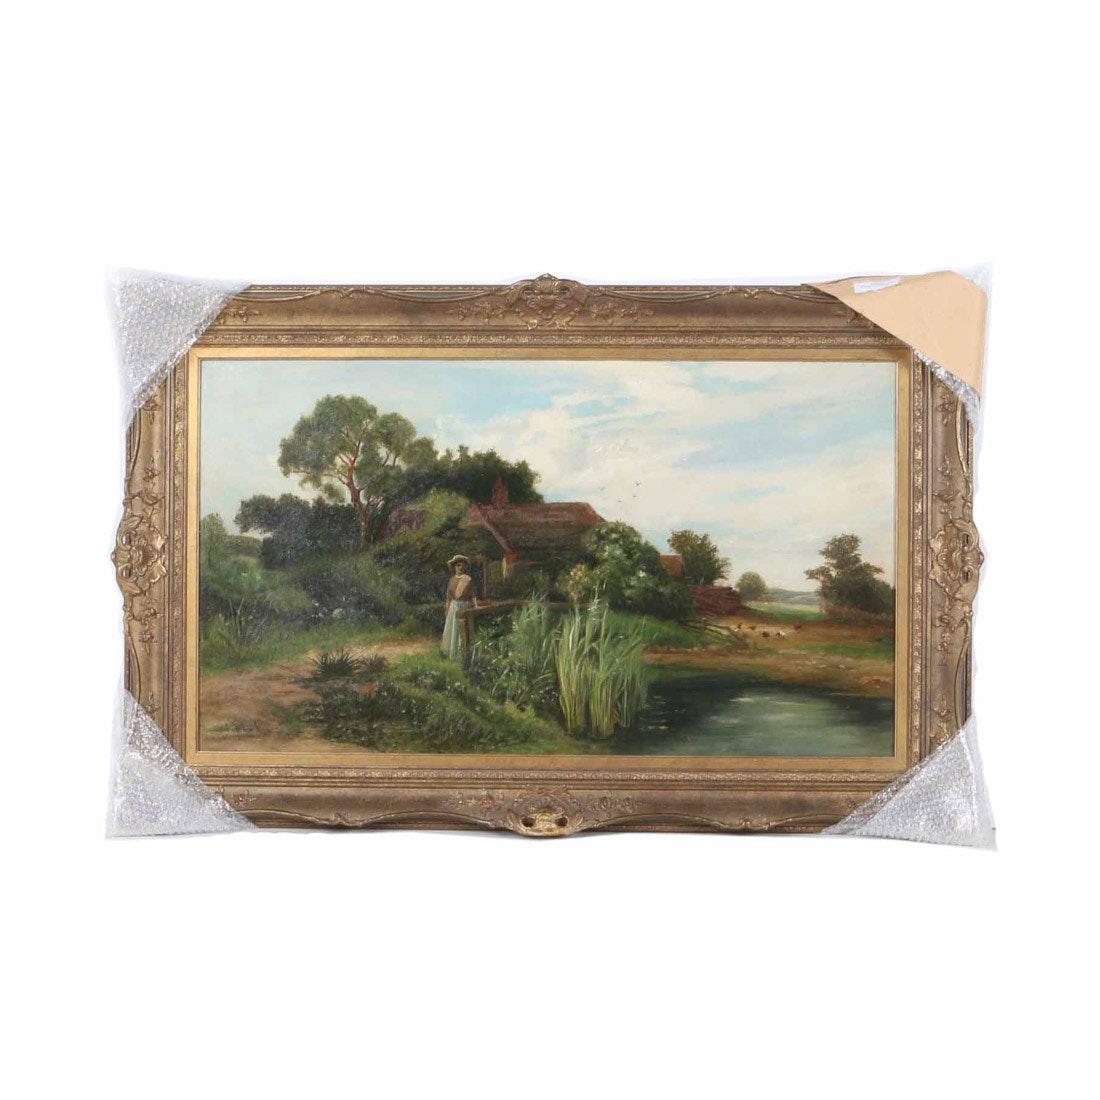 "John Horace Hooper Oil Painting on Canvas ""Figure in Landscape"""